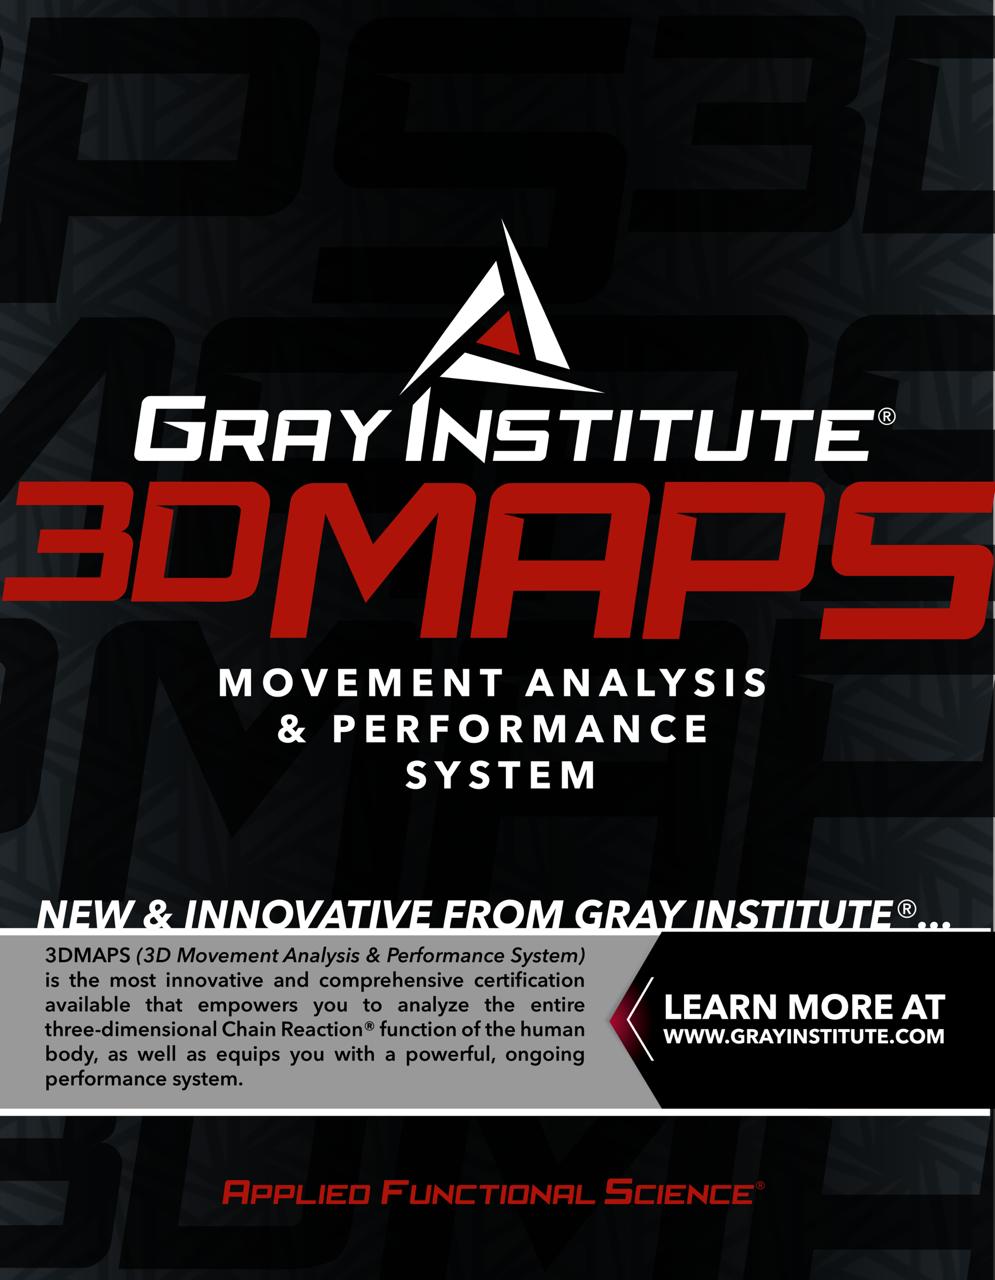 3DMAPS (3D Movement Analysis & Performance System)